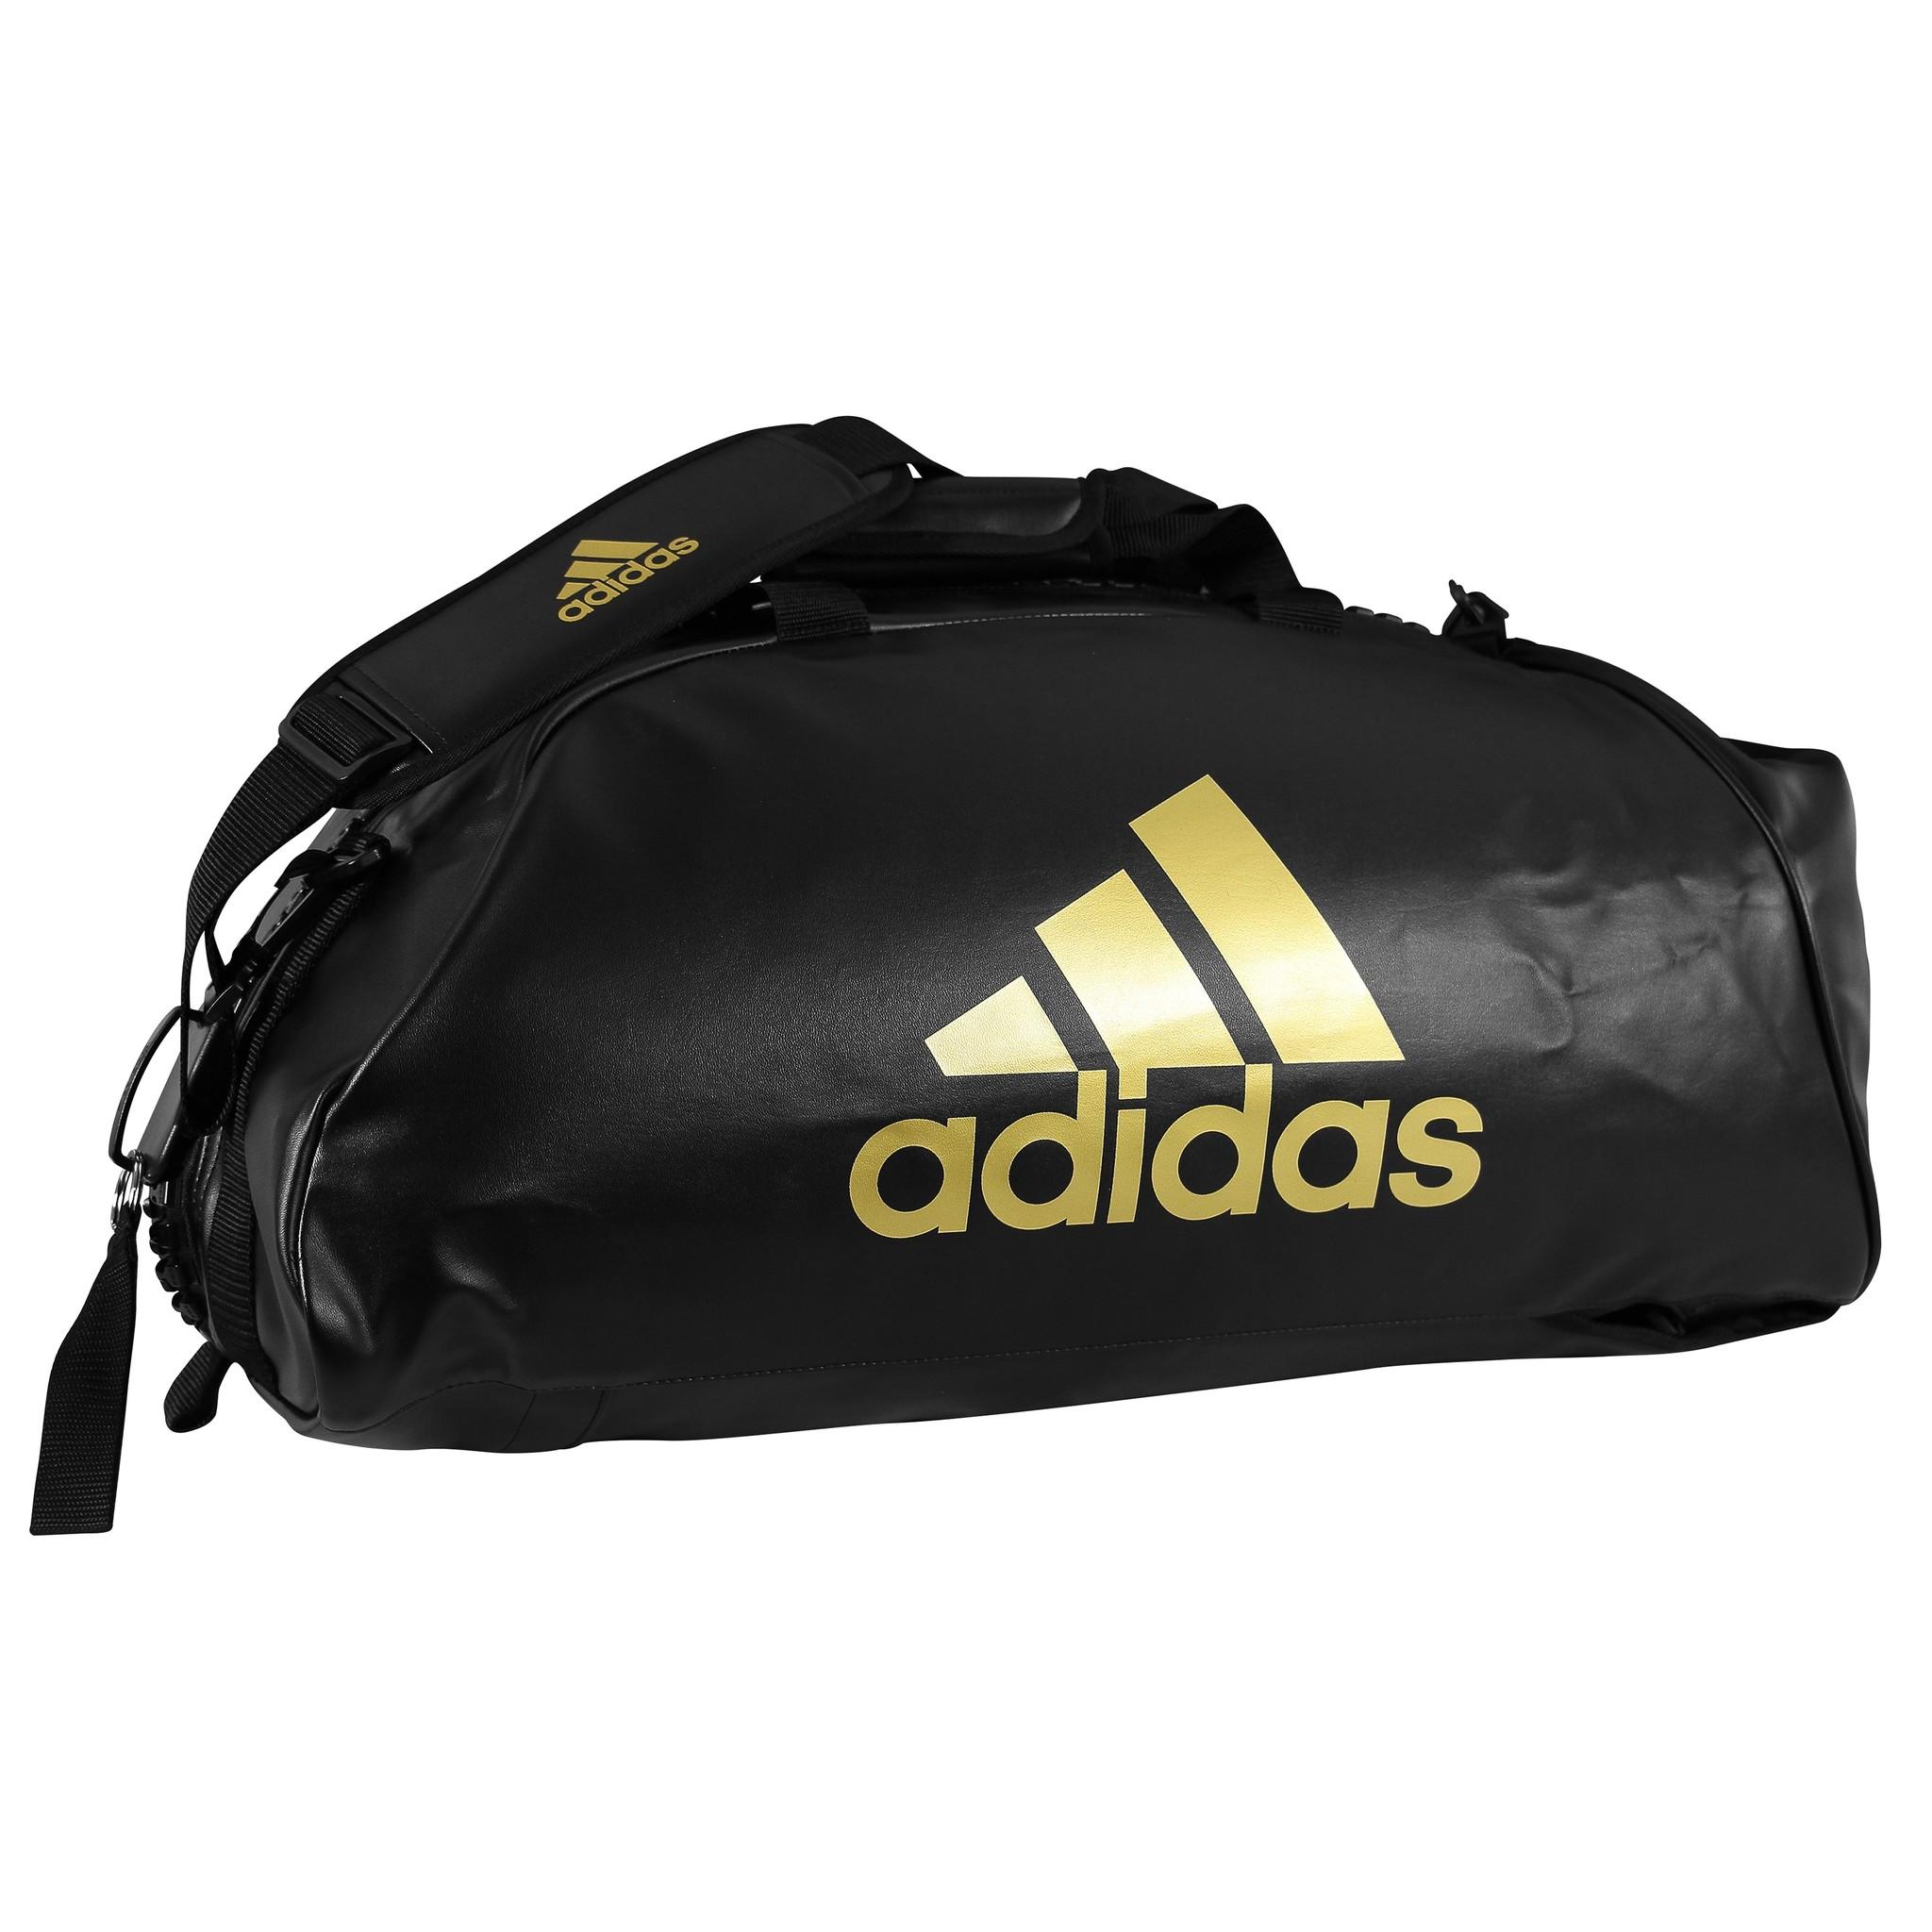 Adidas adidas Training Sporttas Combat 2 in 1 Zwart/Goud Large